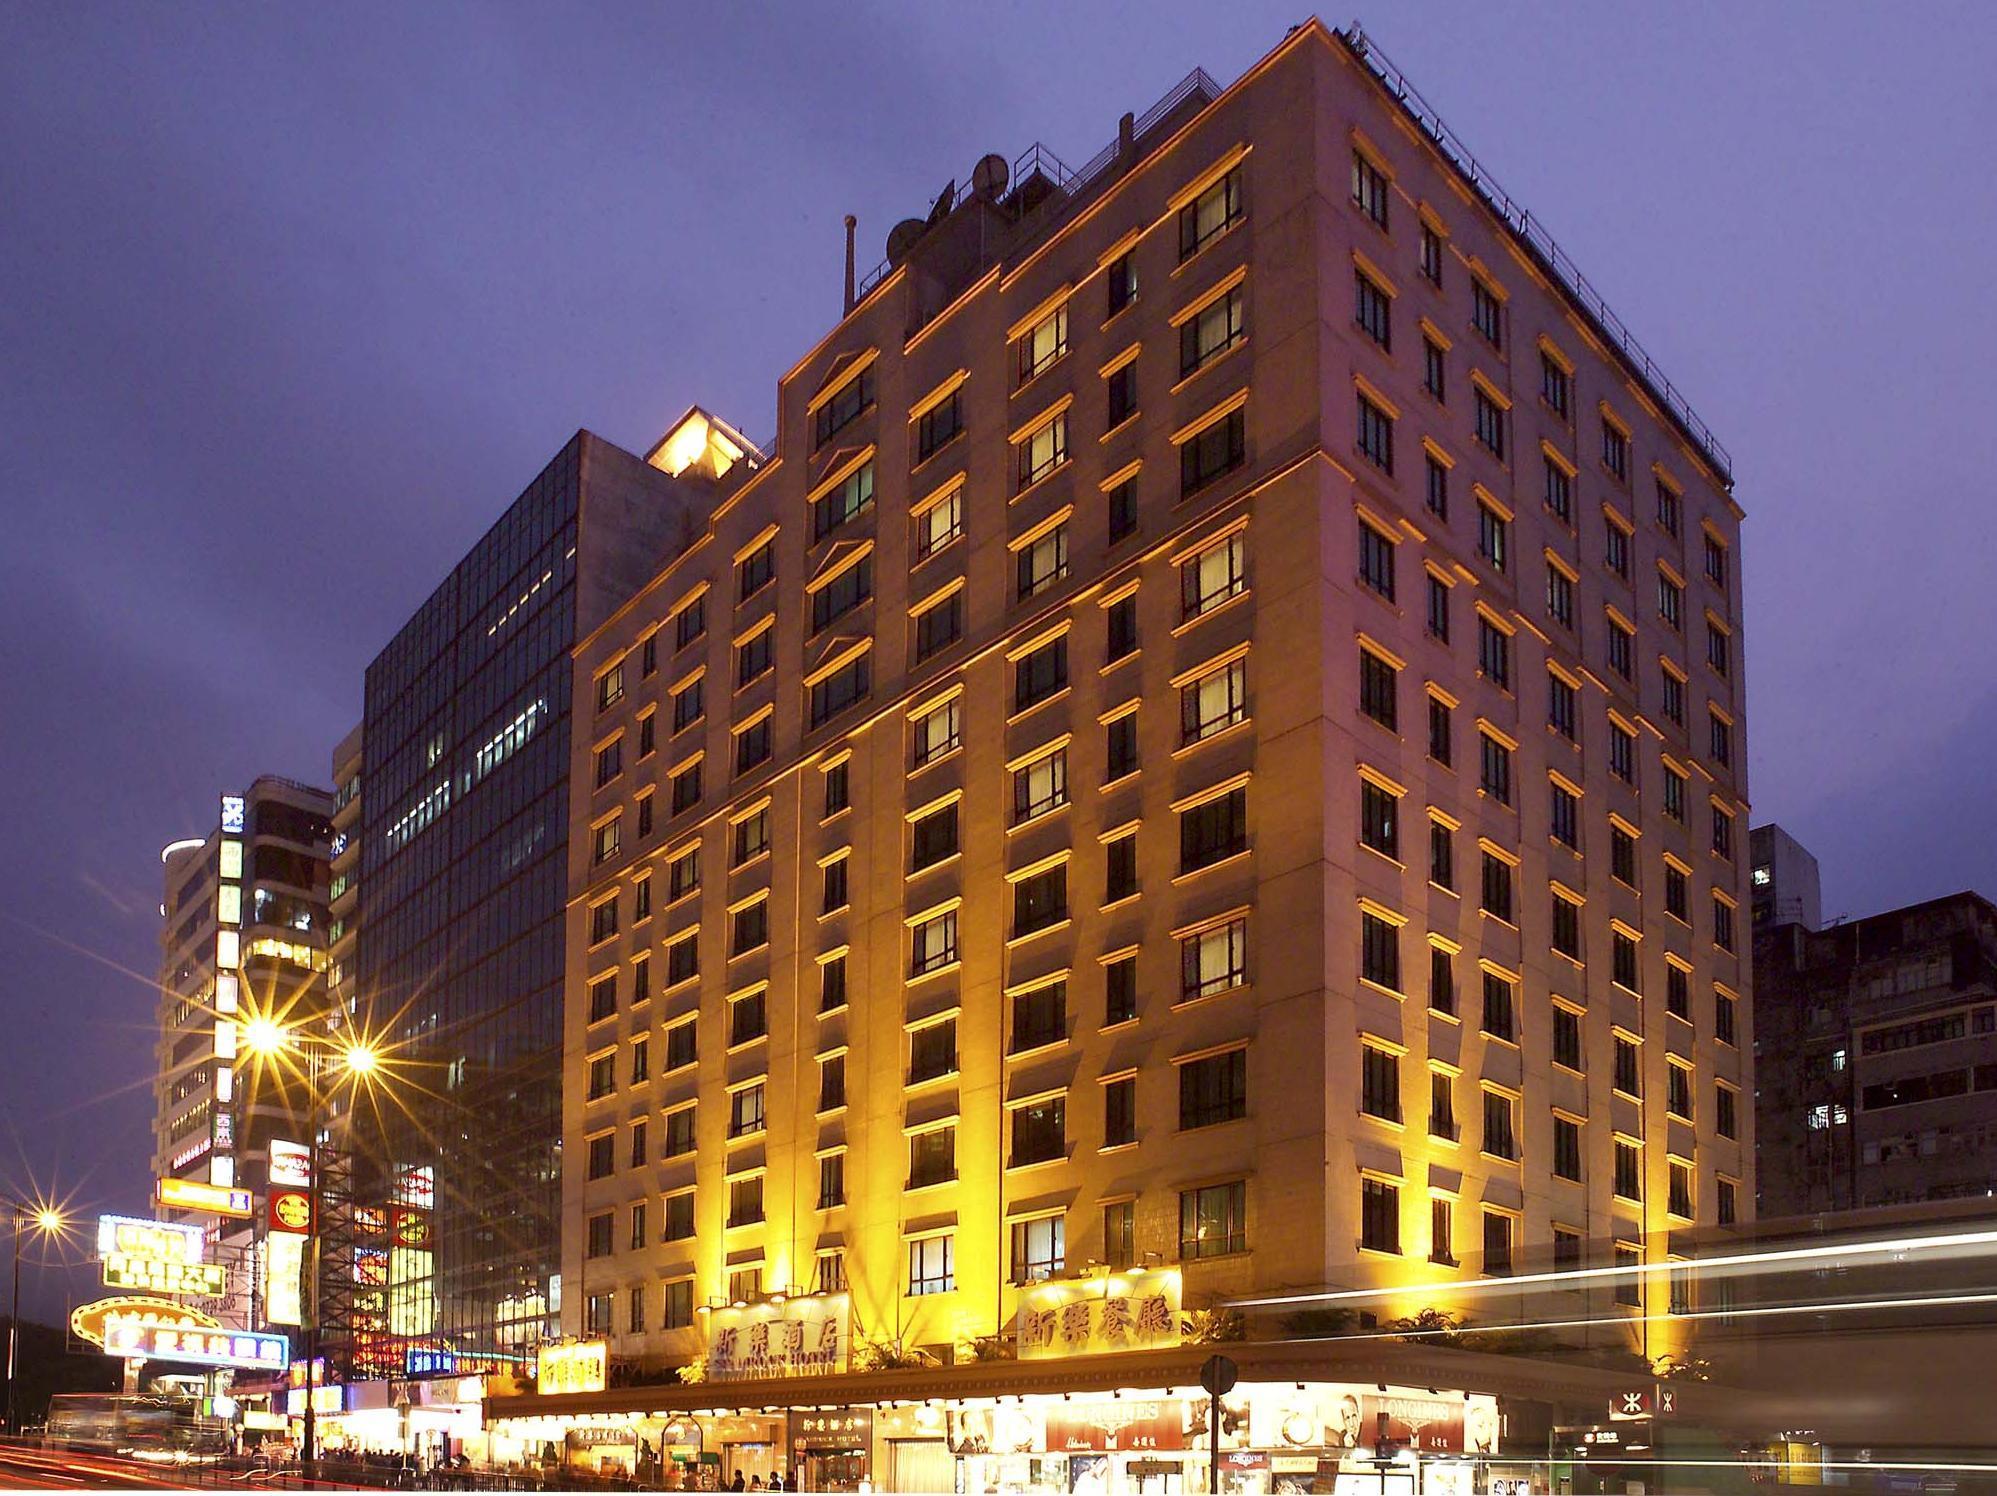 Shamrock hotel hong kong pictures